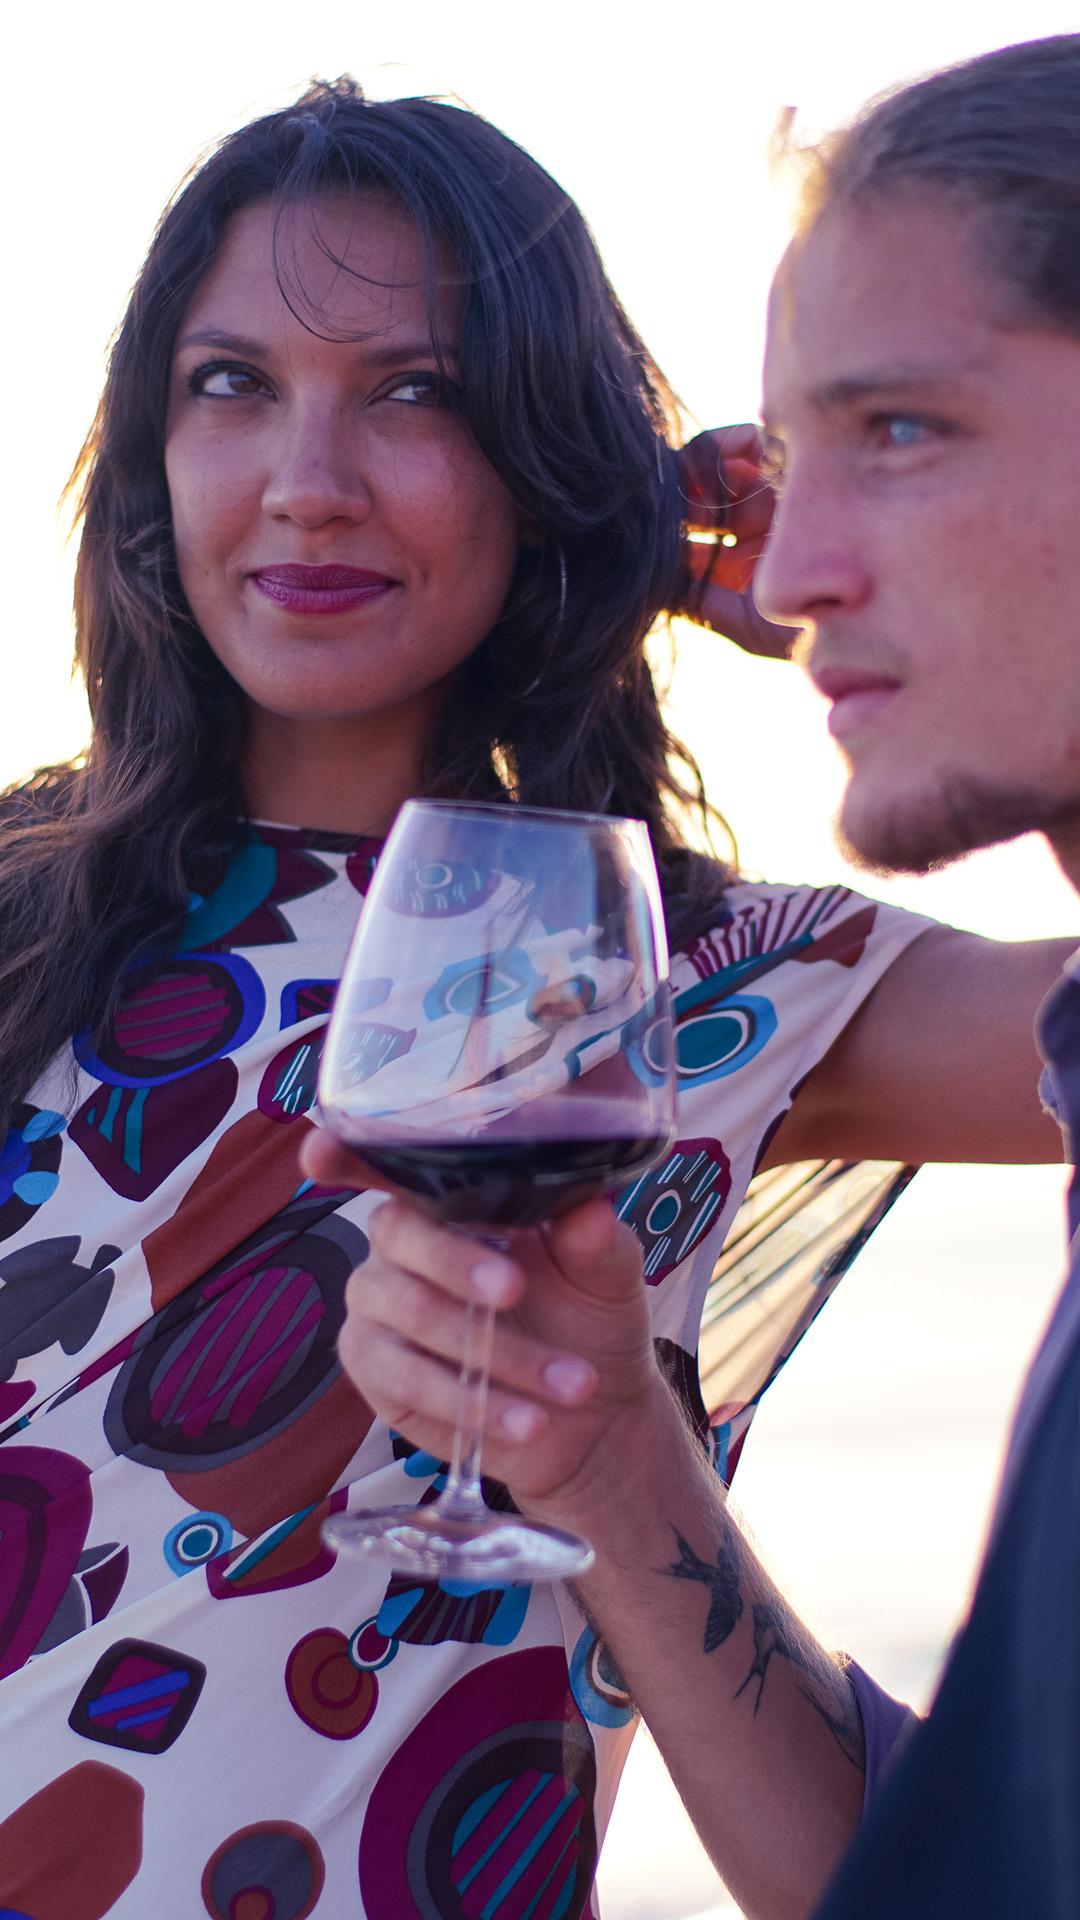 primitivo grifone-#wineofitaly